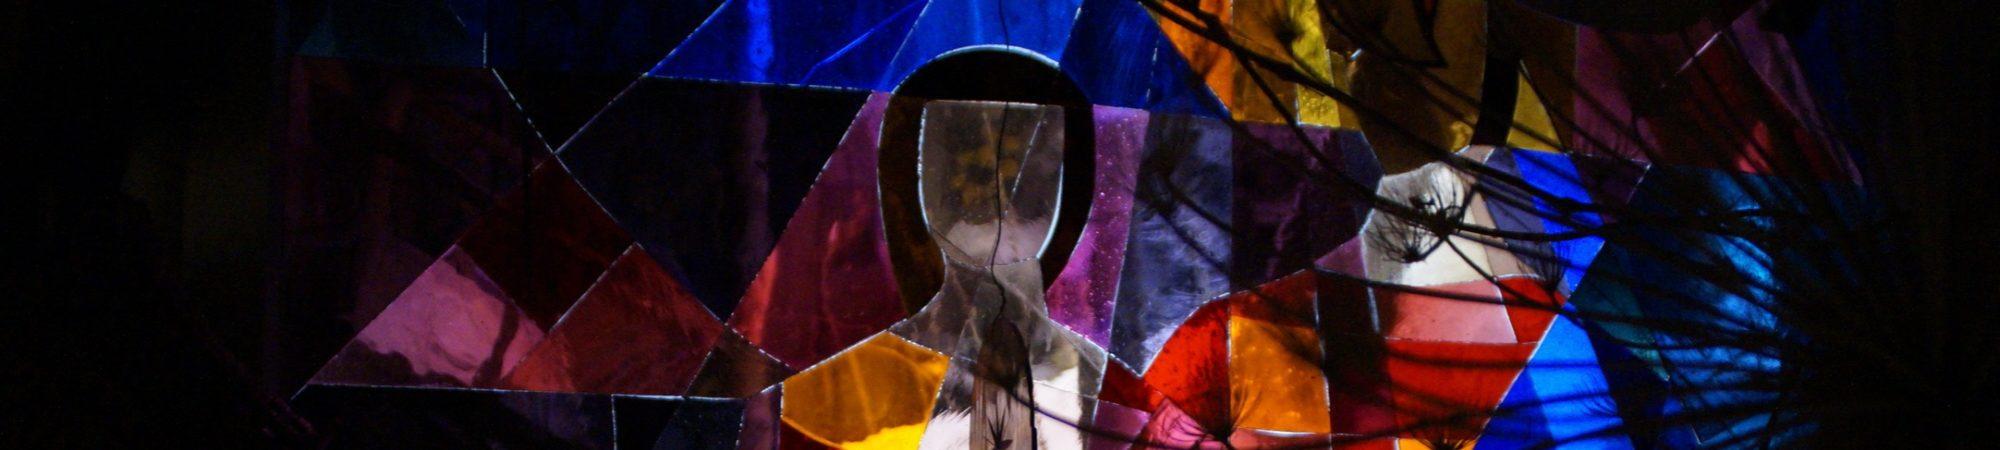 person-light-abstract-night-windowv6.jpg